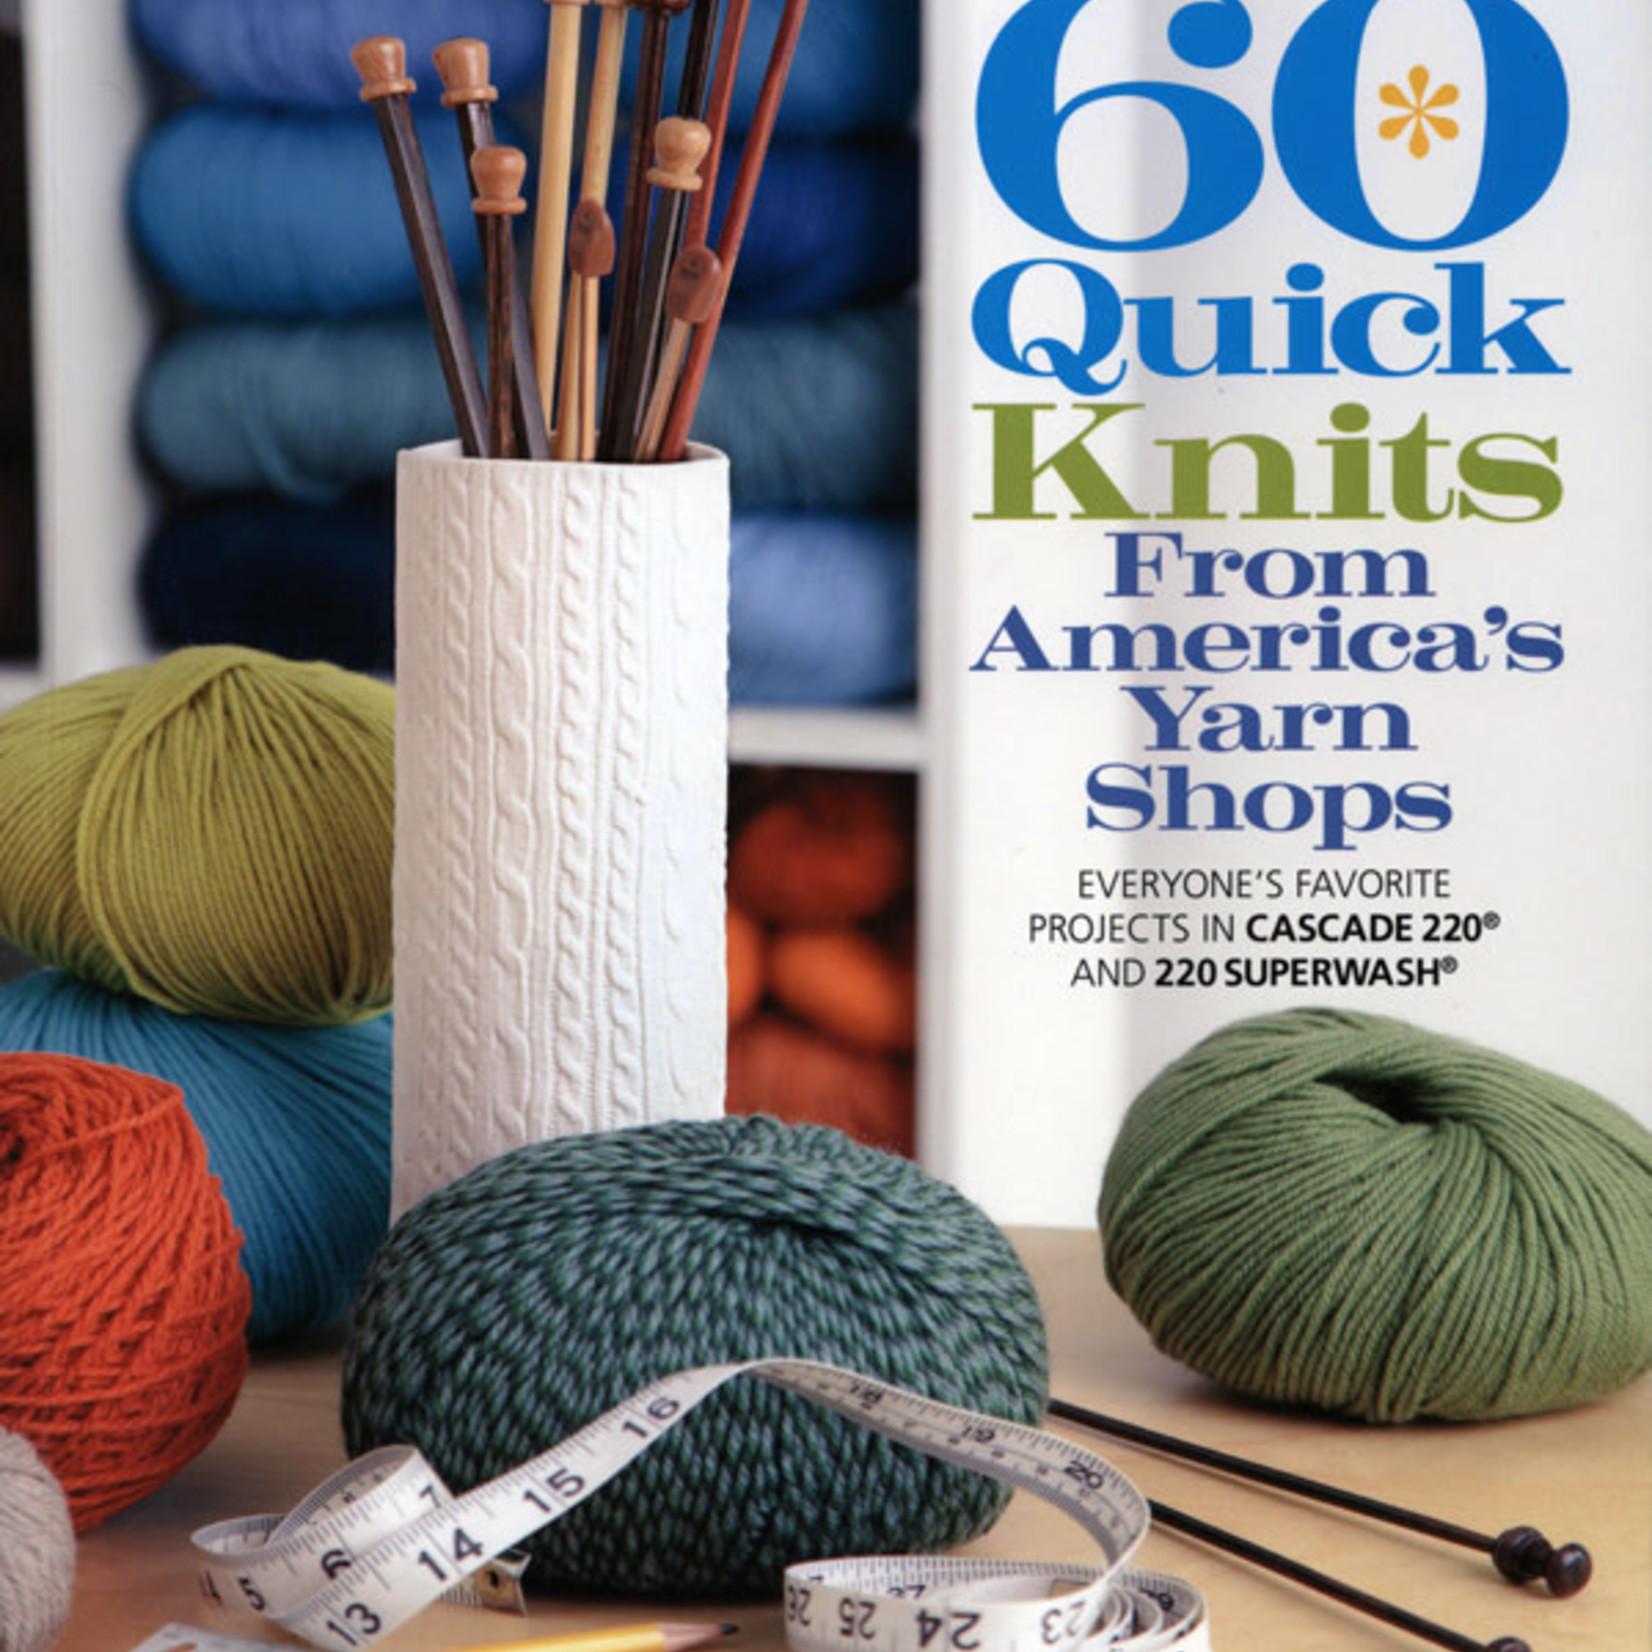 Cascade Yarns 60 Quick Books